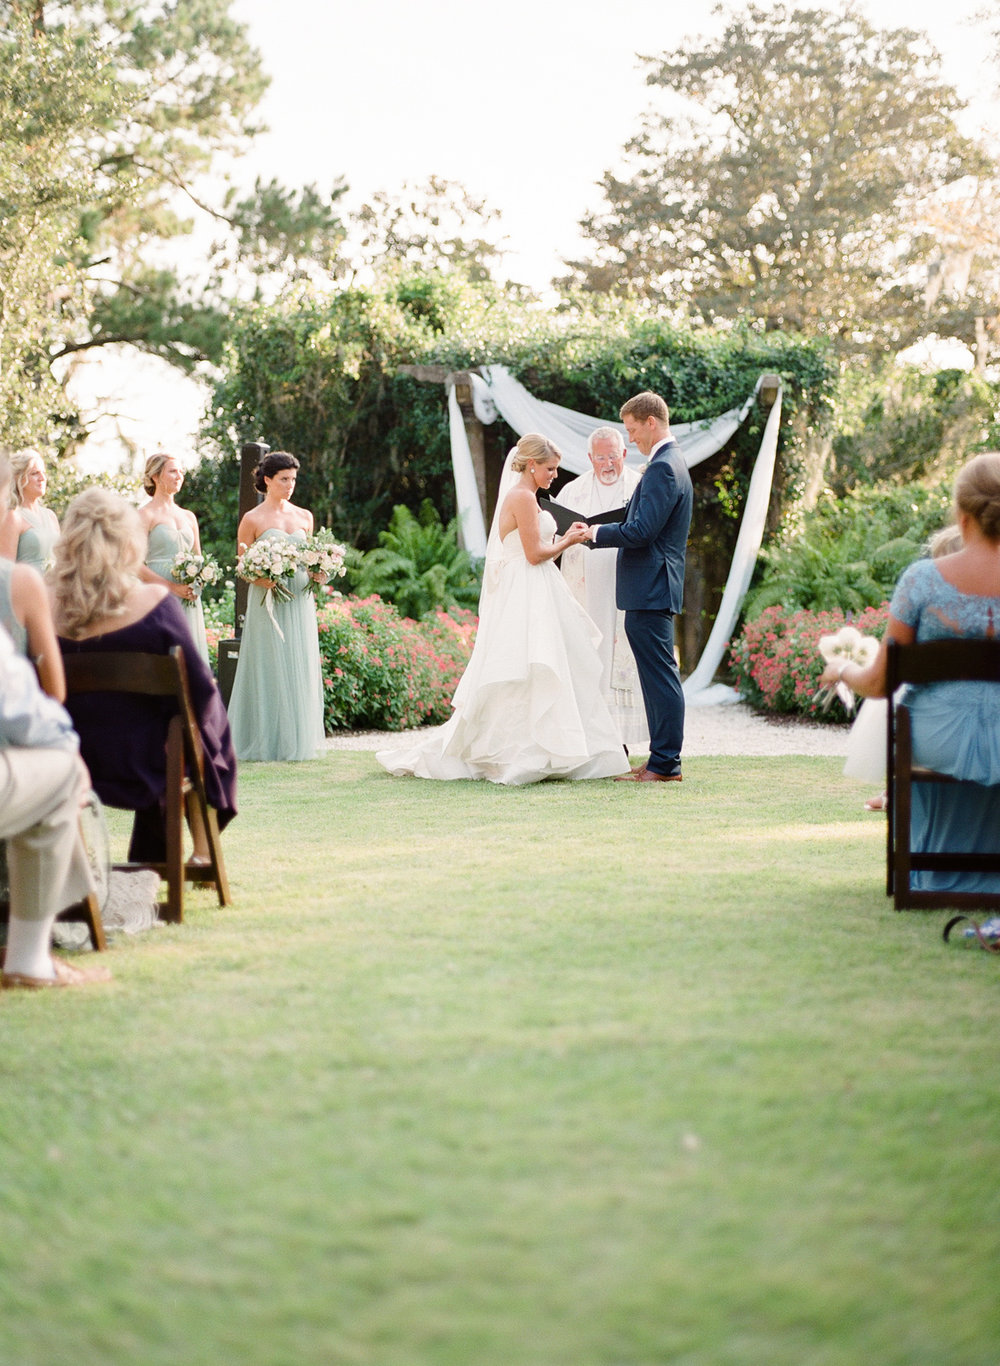 Airlie-Gardens-Wedding-41.jpg